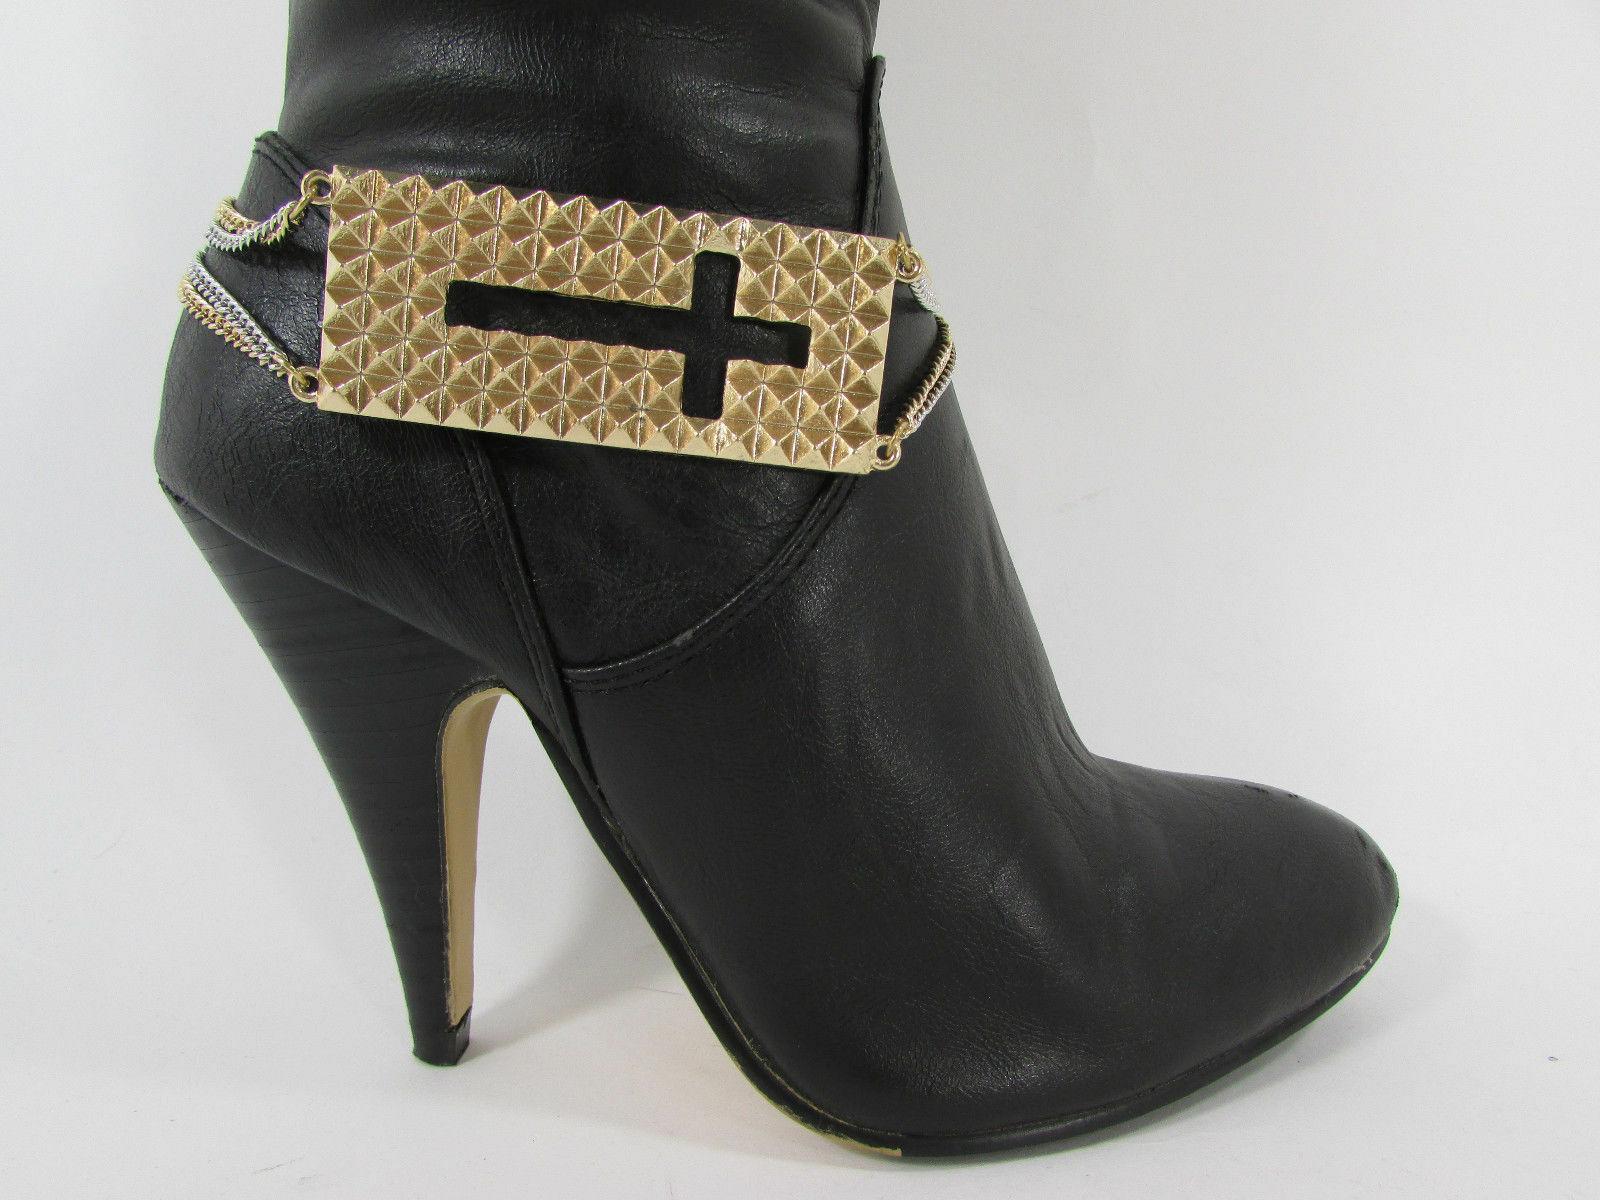 Mujer Moda Joyería Bota Brazalete Oro Placa Cruz Cadenas Zapato Bling Charm image 10